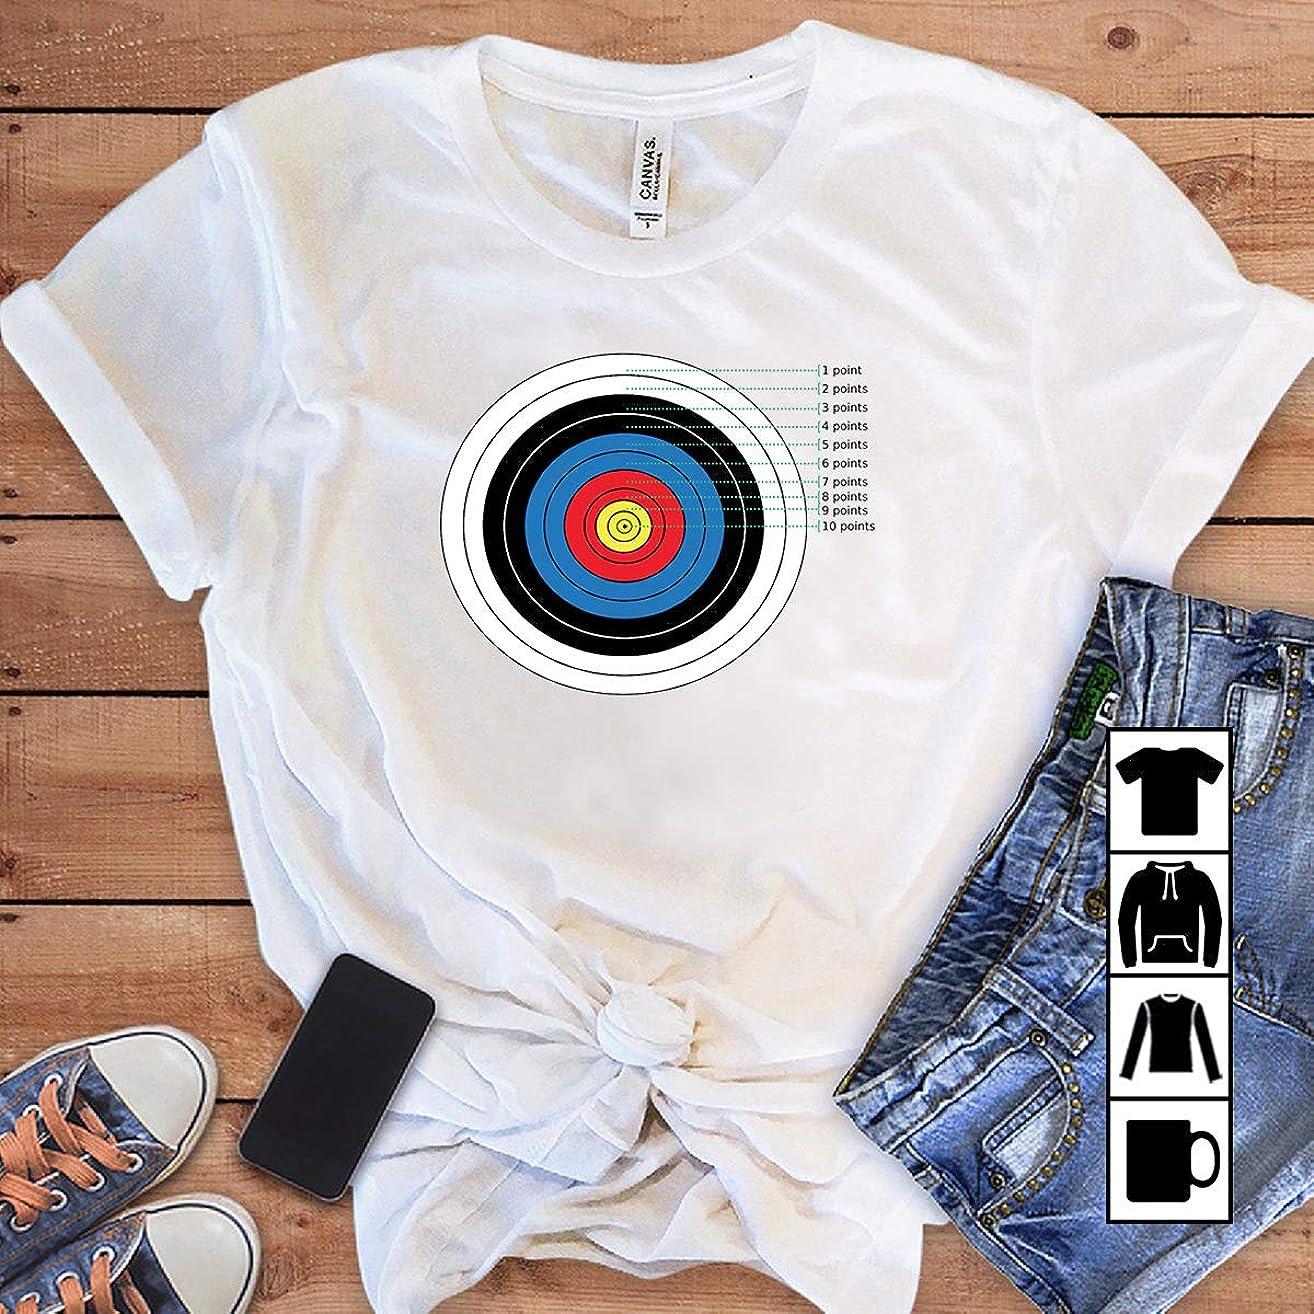 Bowman Archer Archery Target Points T Shirt Long Sleeve Sweatshirt Hoodie Yout